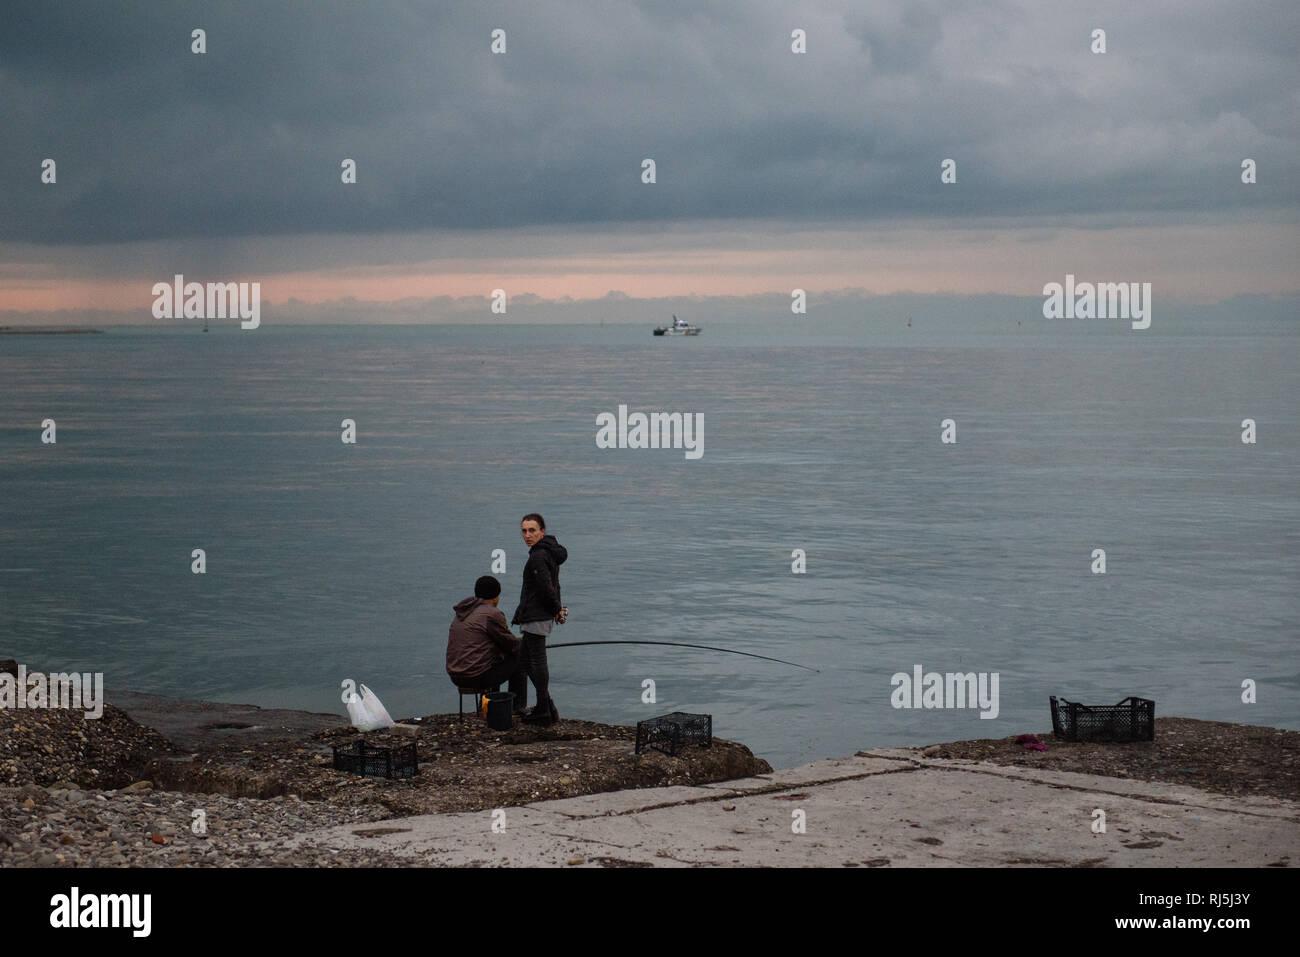 Batumi, das Las Vegas am schwarzen Meer. Georgien, Oktober 2016 - Stock Image